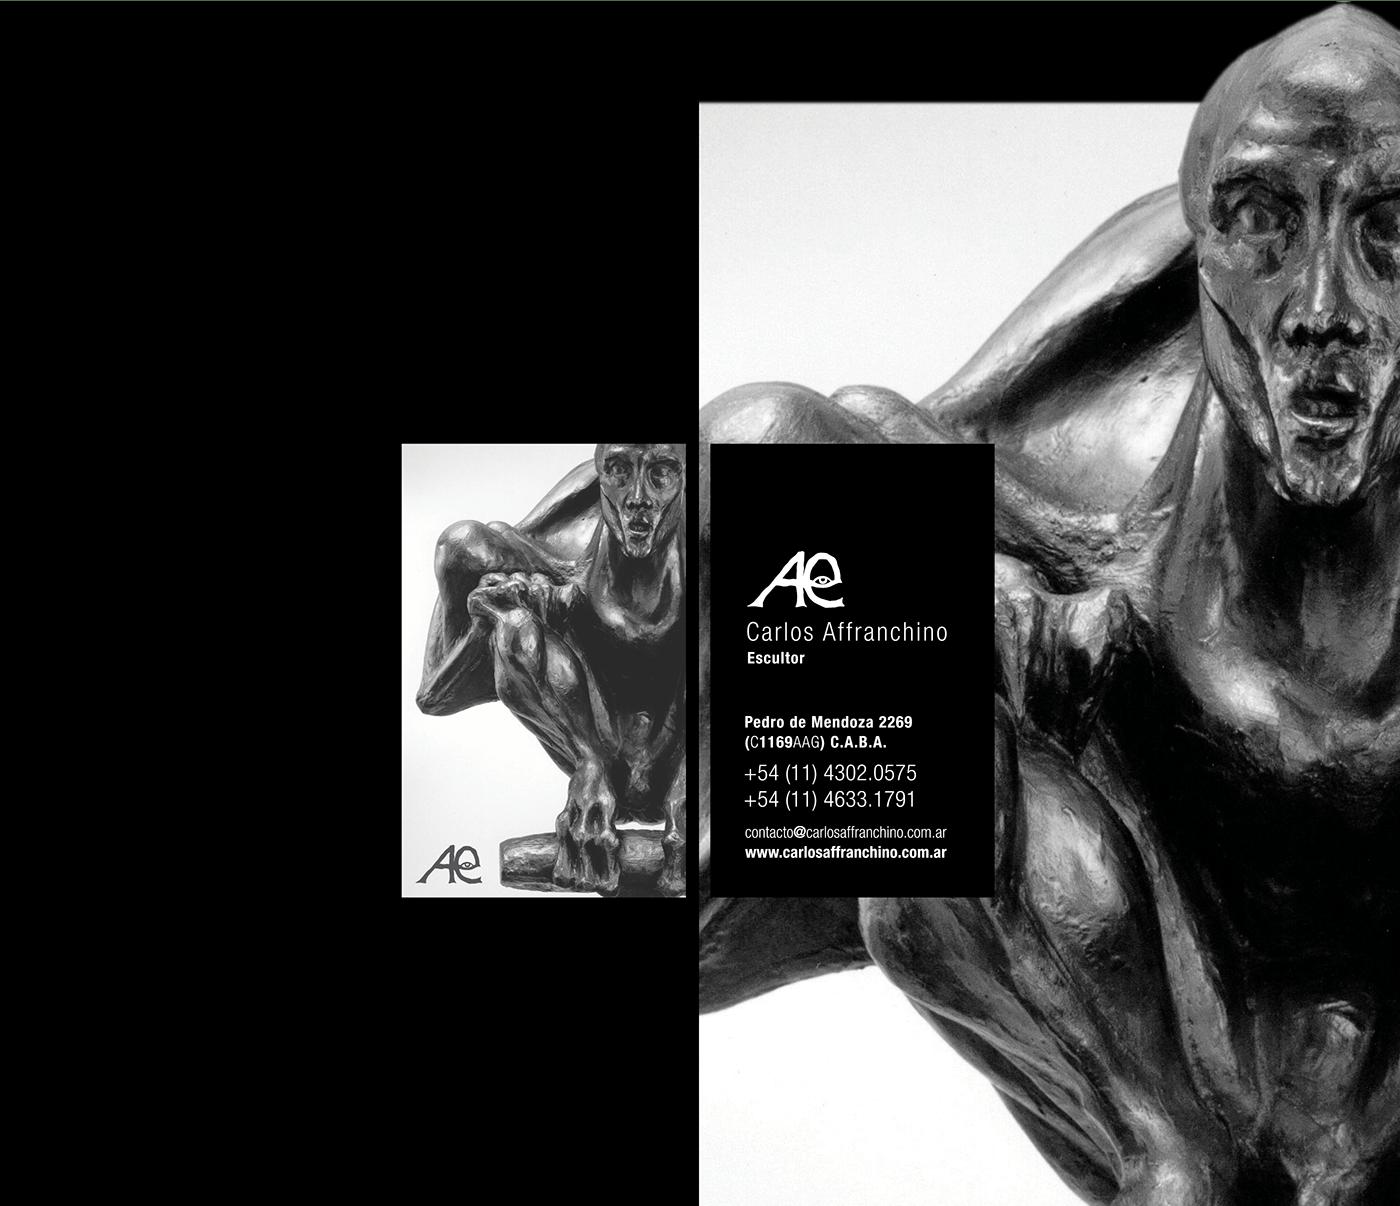 escultura sculpture arte art carlos affranchino Escultor buenos aires argentina